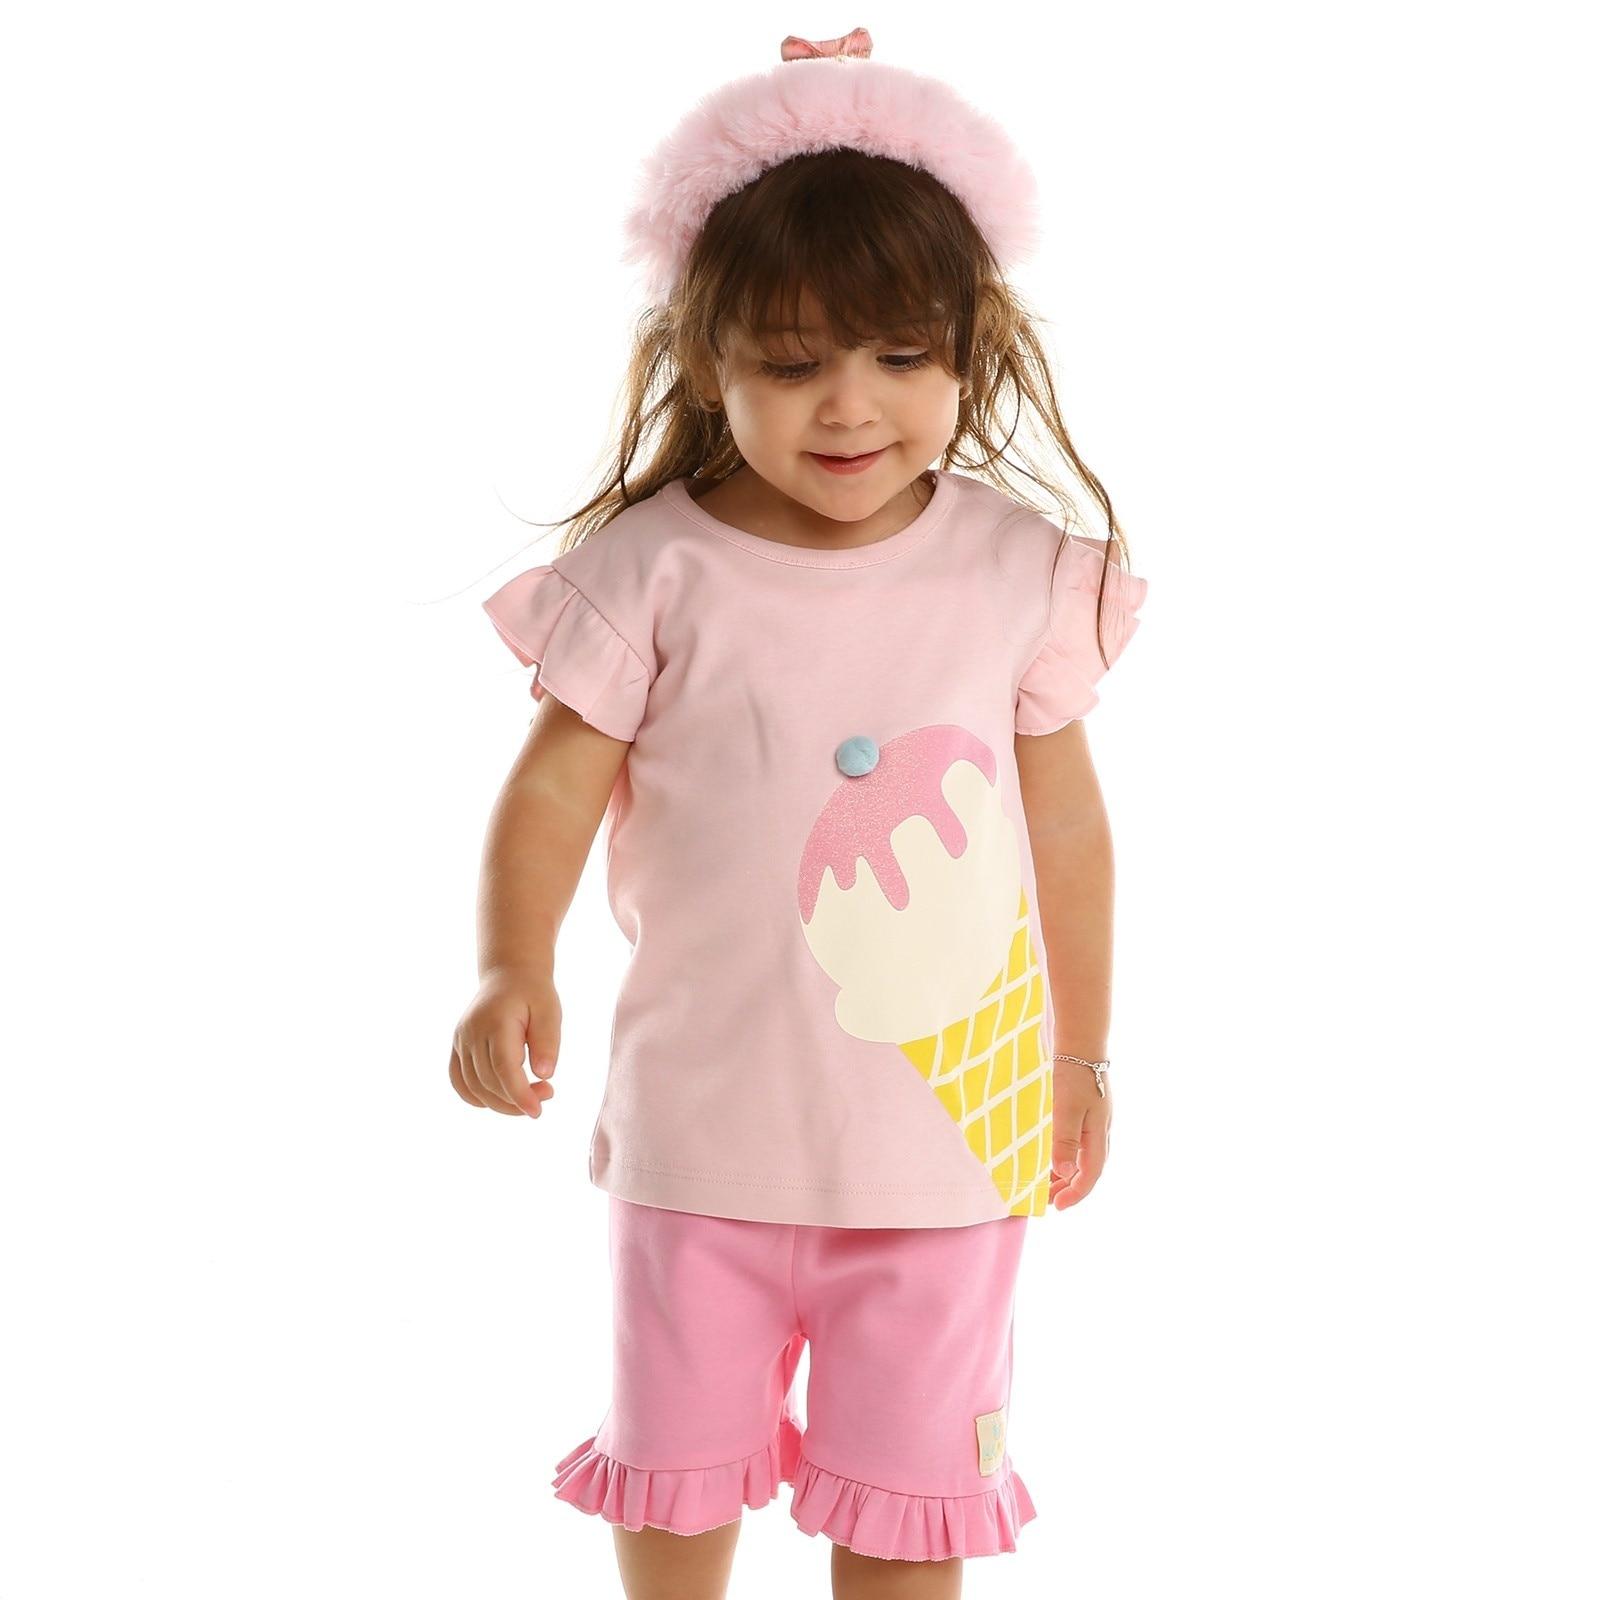 Ebebek HelloBaby Summer Baby Sweet Fruits T-shirt Short Set